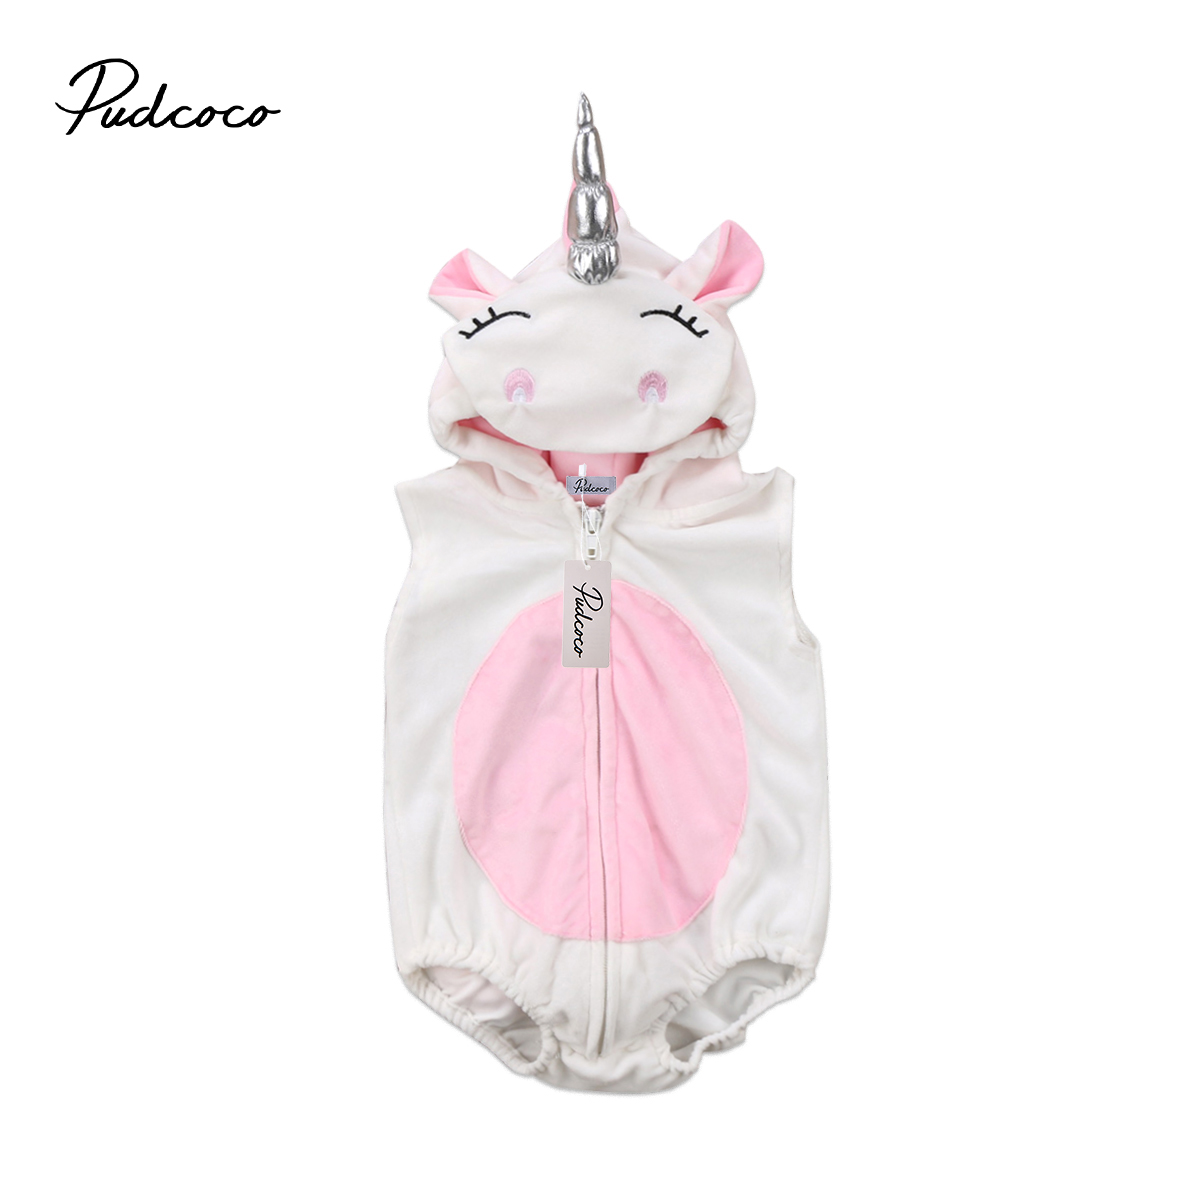 pudcoco Newest Arrivals Hot Infant Newborn Toddler Unicorn Costume Kids Girls Bodysuits Jumpsuit Jumper Outfits Fleece Clothes